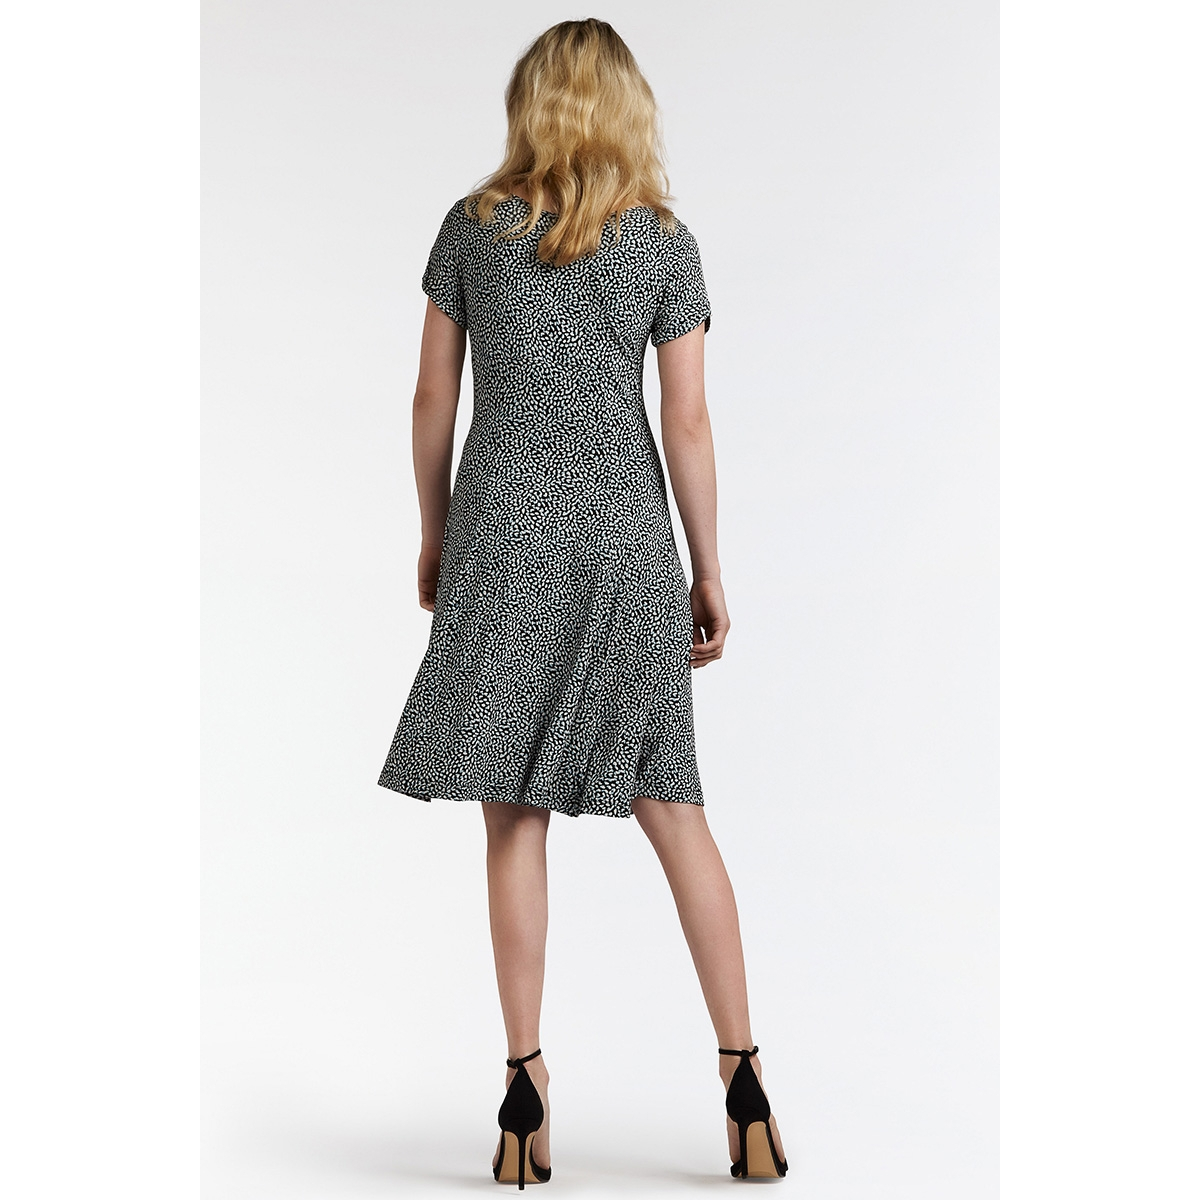 0efdcc72f3cda5 ... zwierige jurk met print 23001559 sandwich jurk 41010